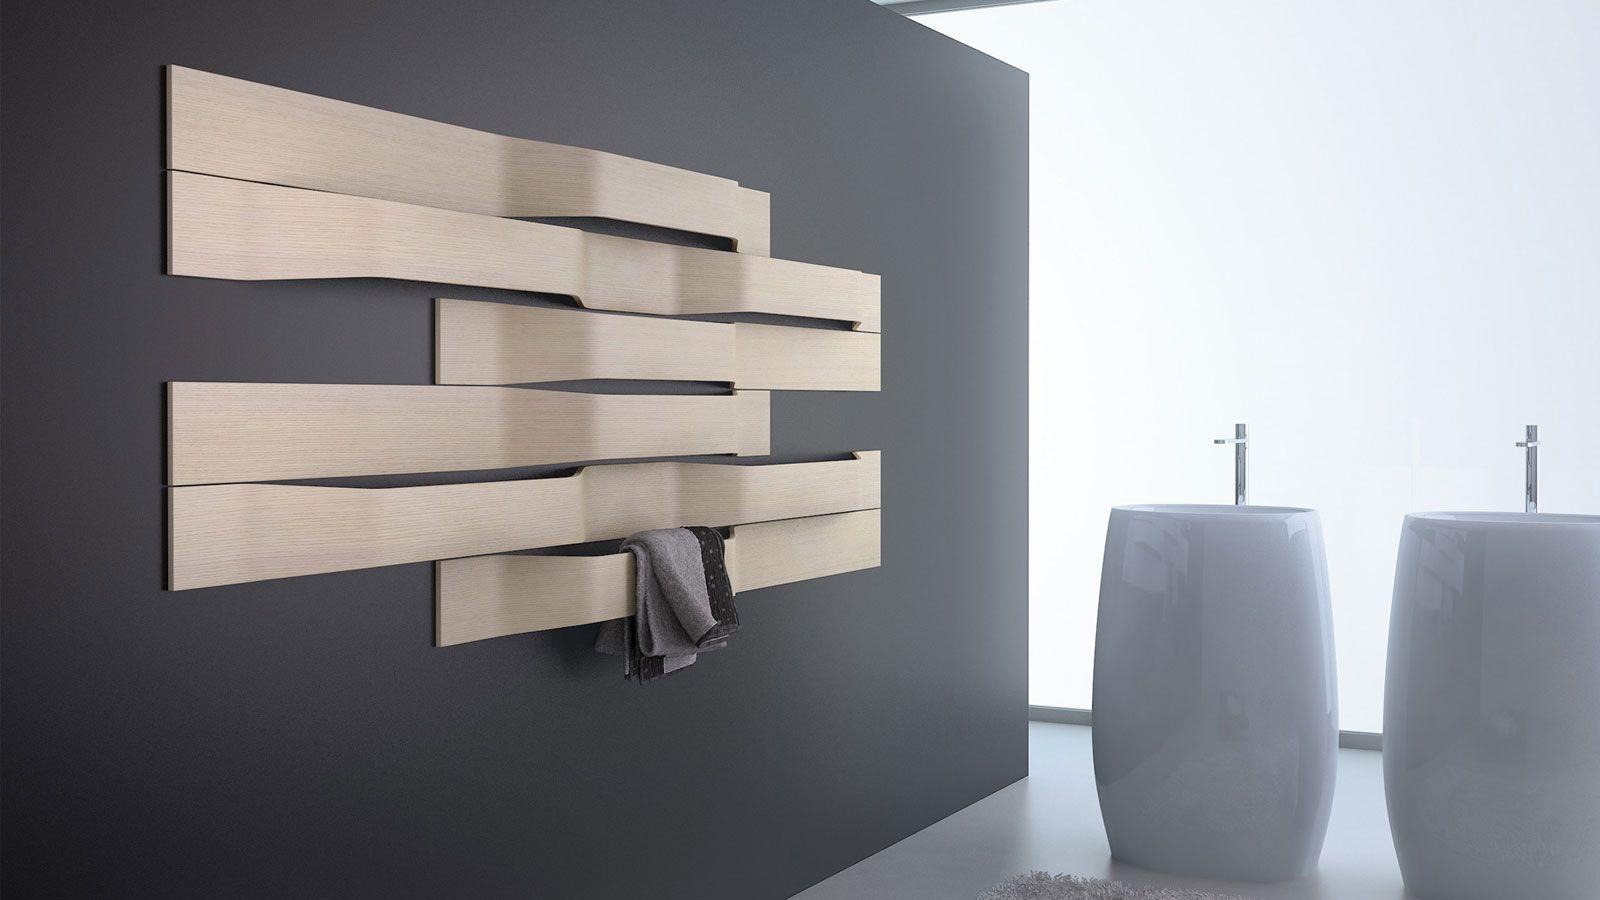 Carrelage Salle De Bain Effet Beton ~ Id E Radiateur Design Horizontal Rangement Cach Pinterest